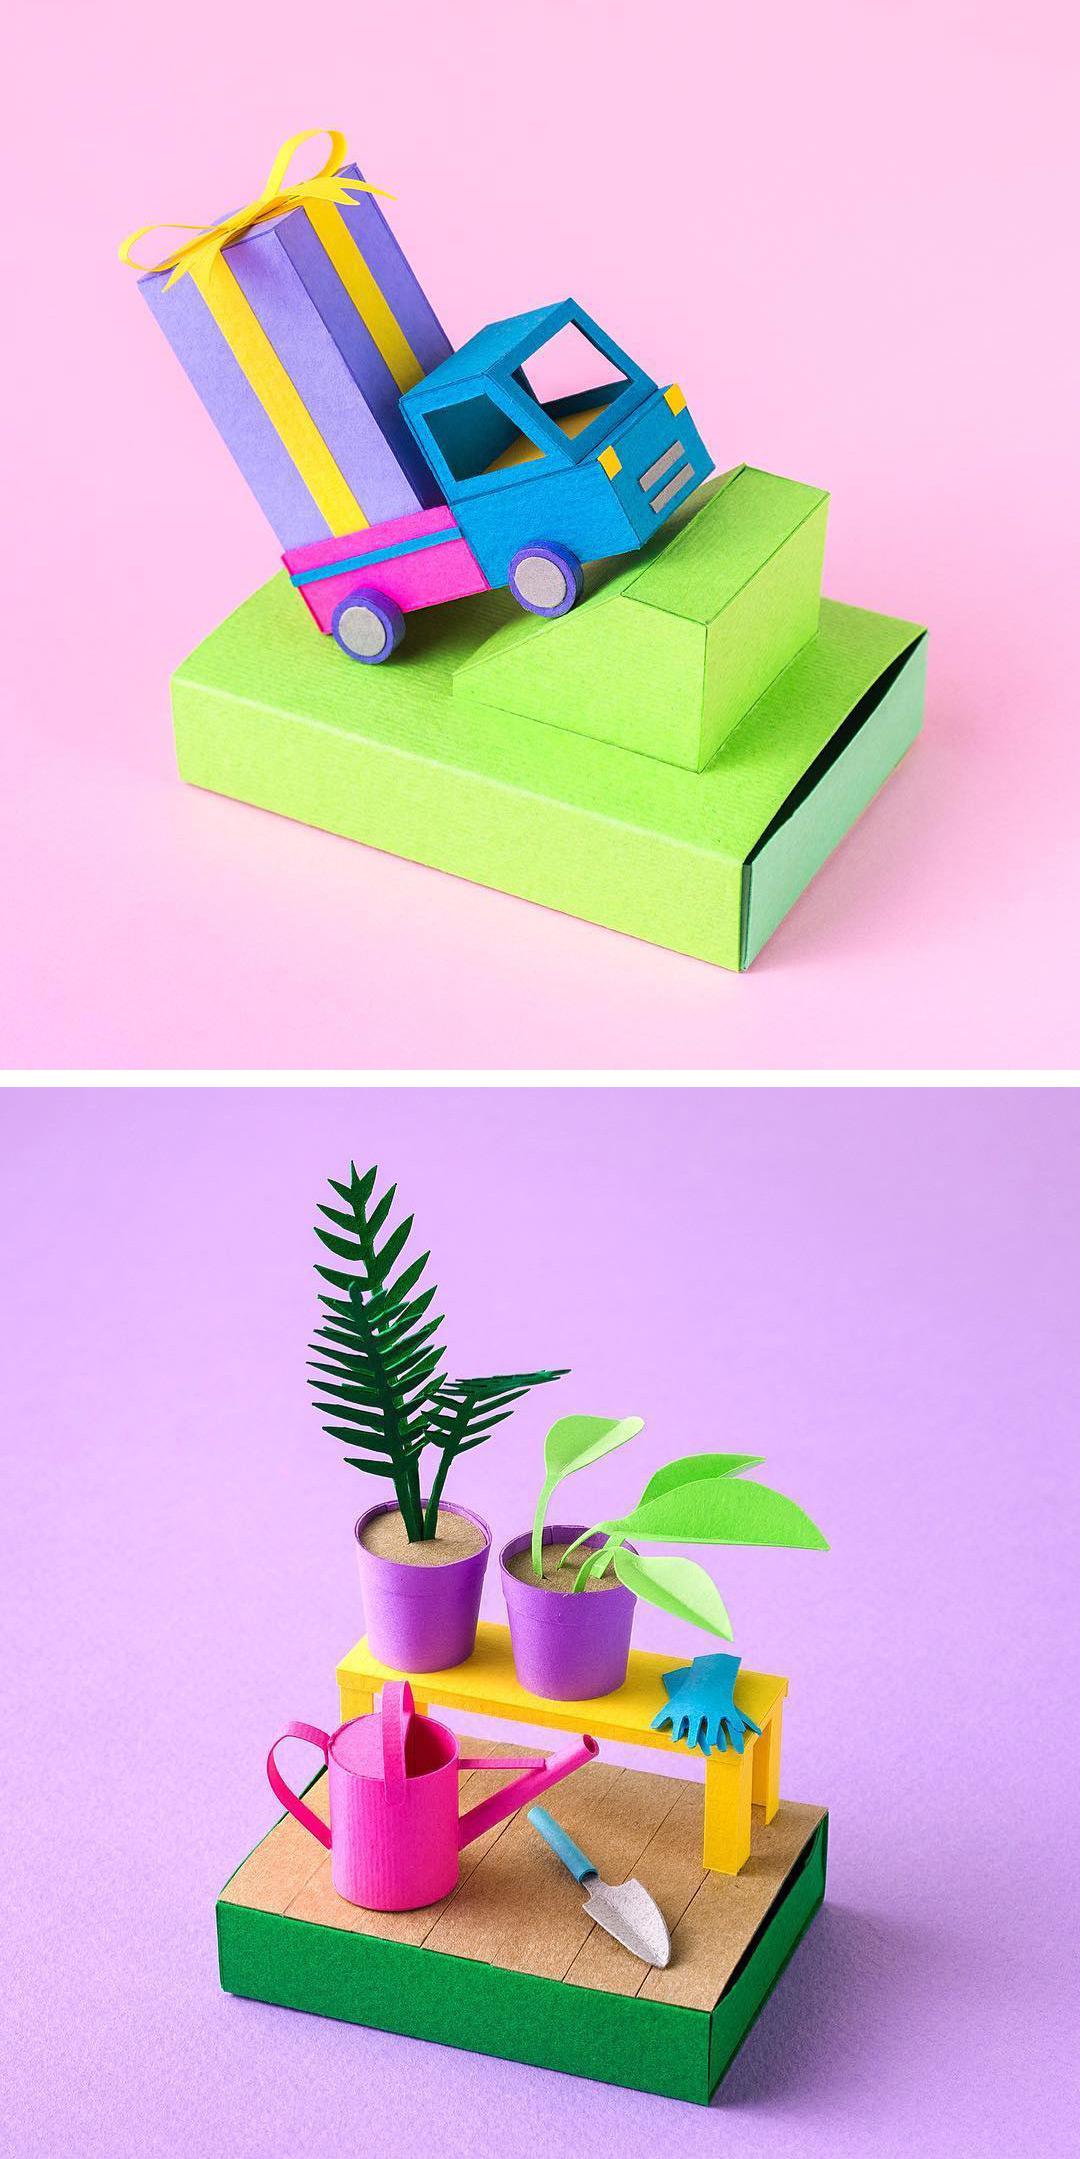 Cut Paper Art by Cheryl Teo